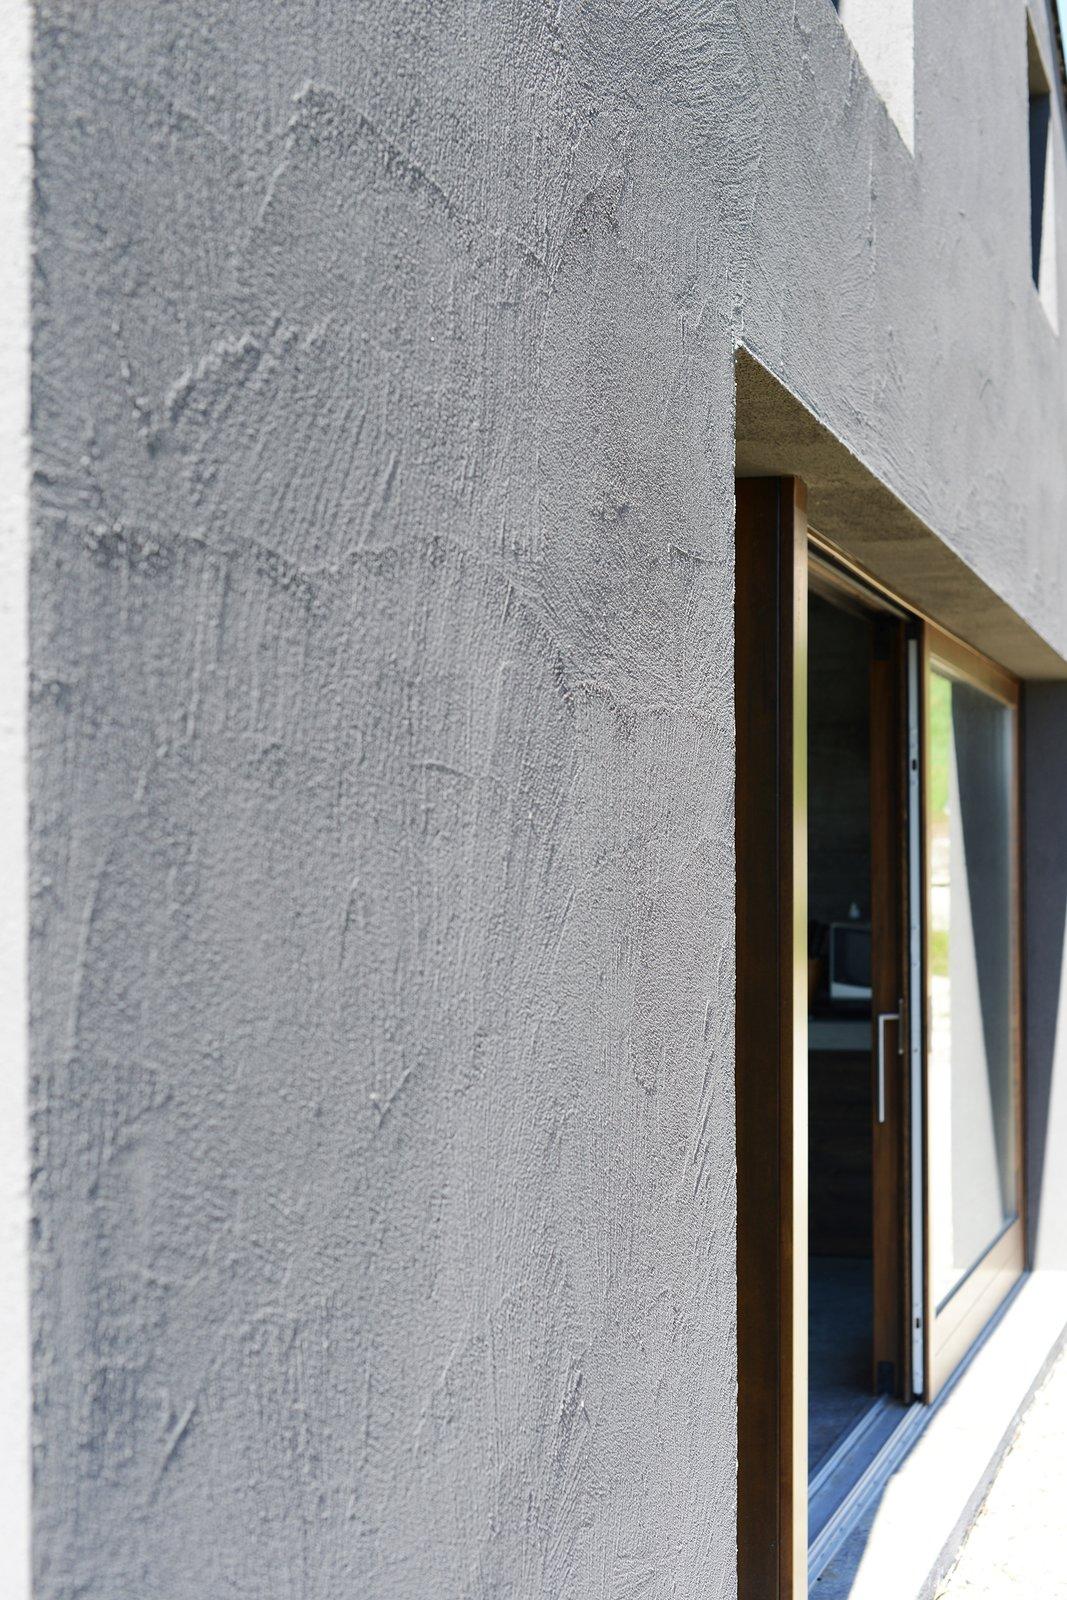 HOUSE R by 35astudio